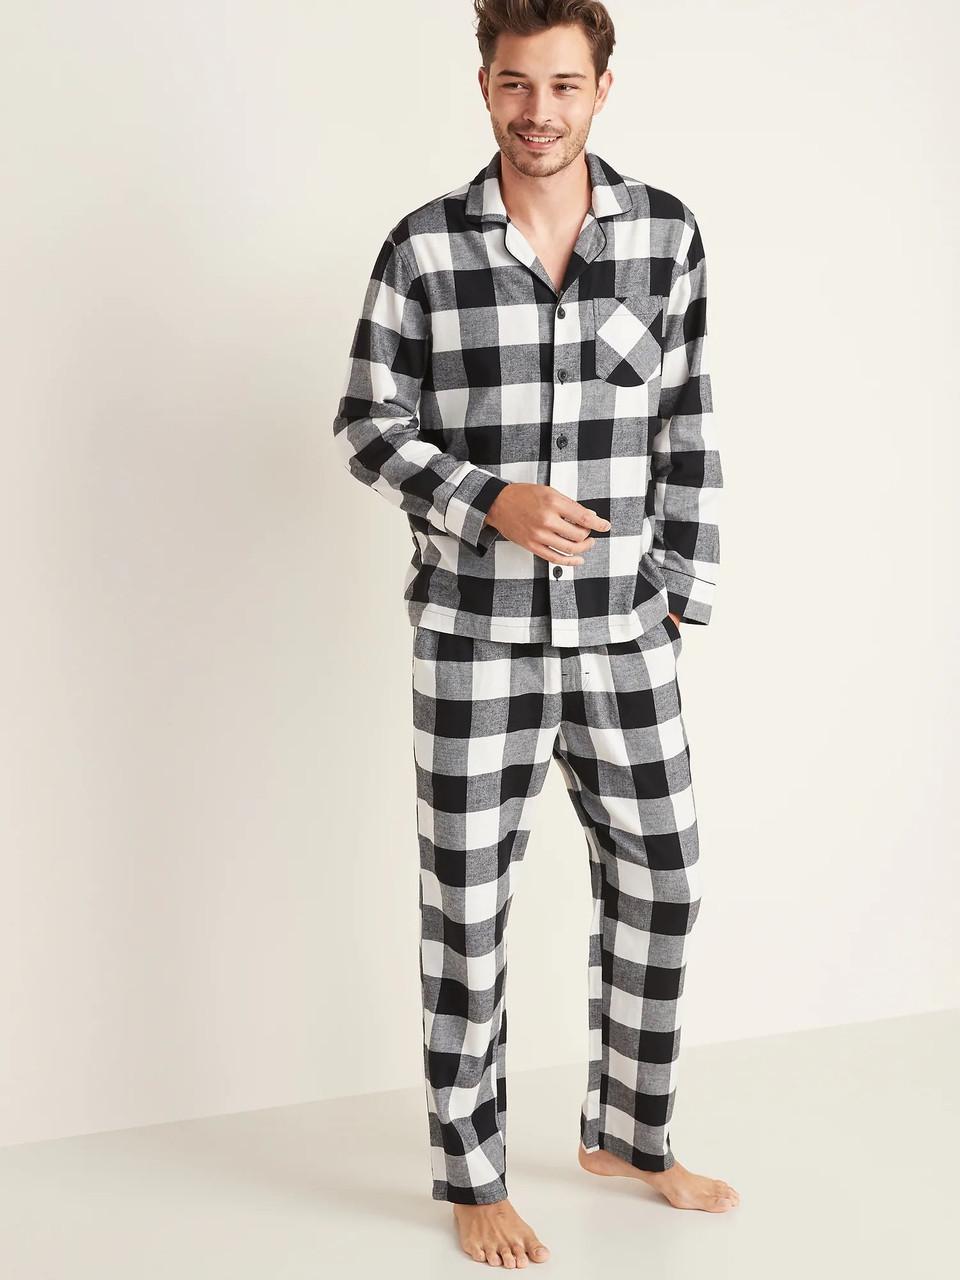 Мужская фланелевая пижама Old Navy XXL XXXL пижамы мужские Олд Неви XXL